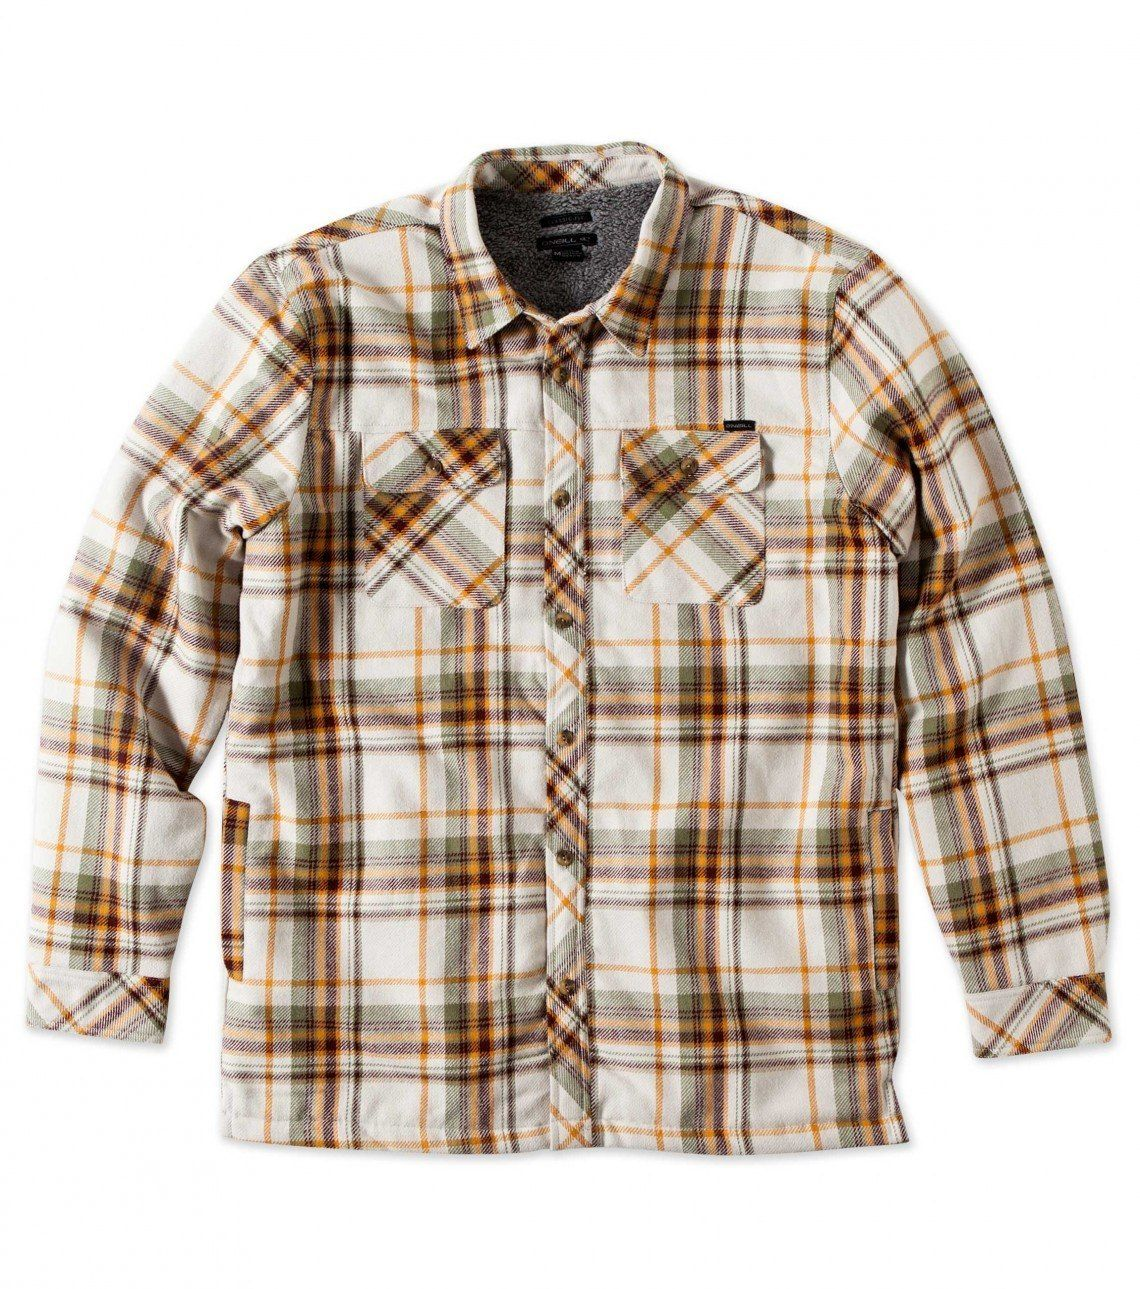 Khaki o 39 neill shelter flannel shirt jacket sherpa for Sherpa lined plaid shirt